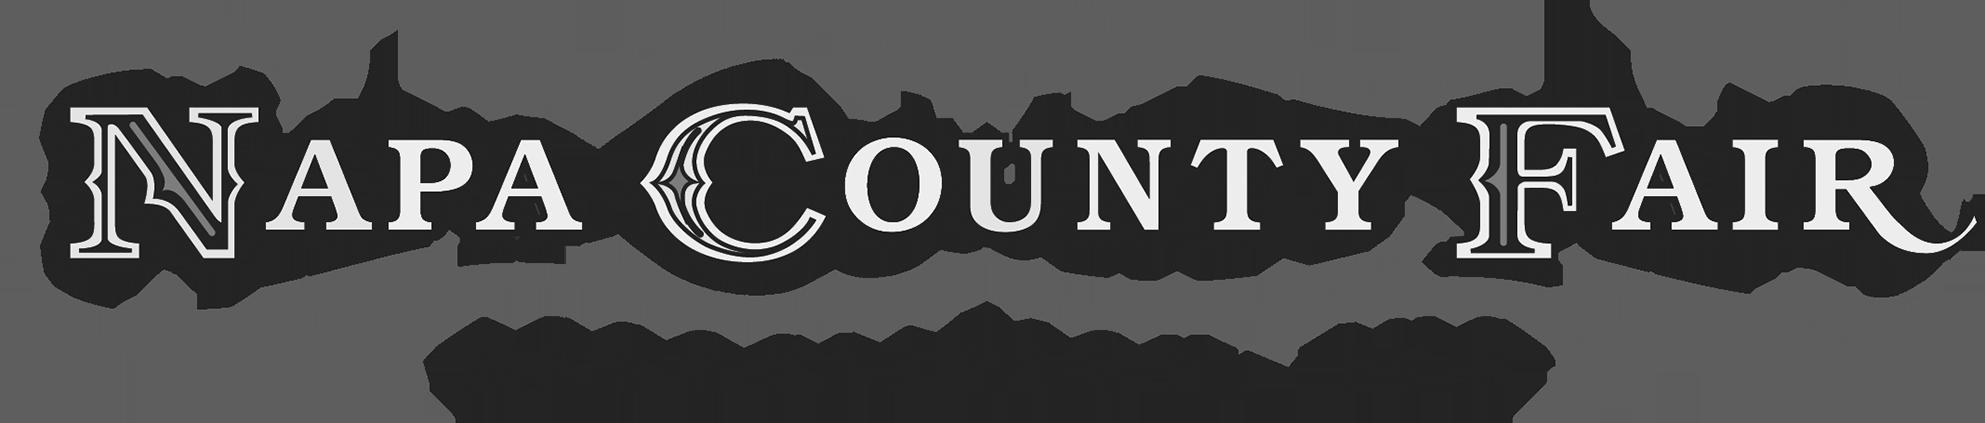 Napa County Fair Association logo